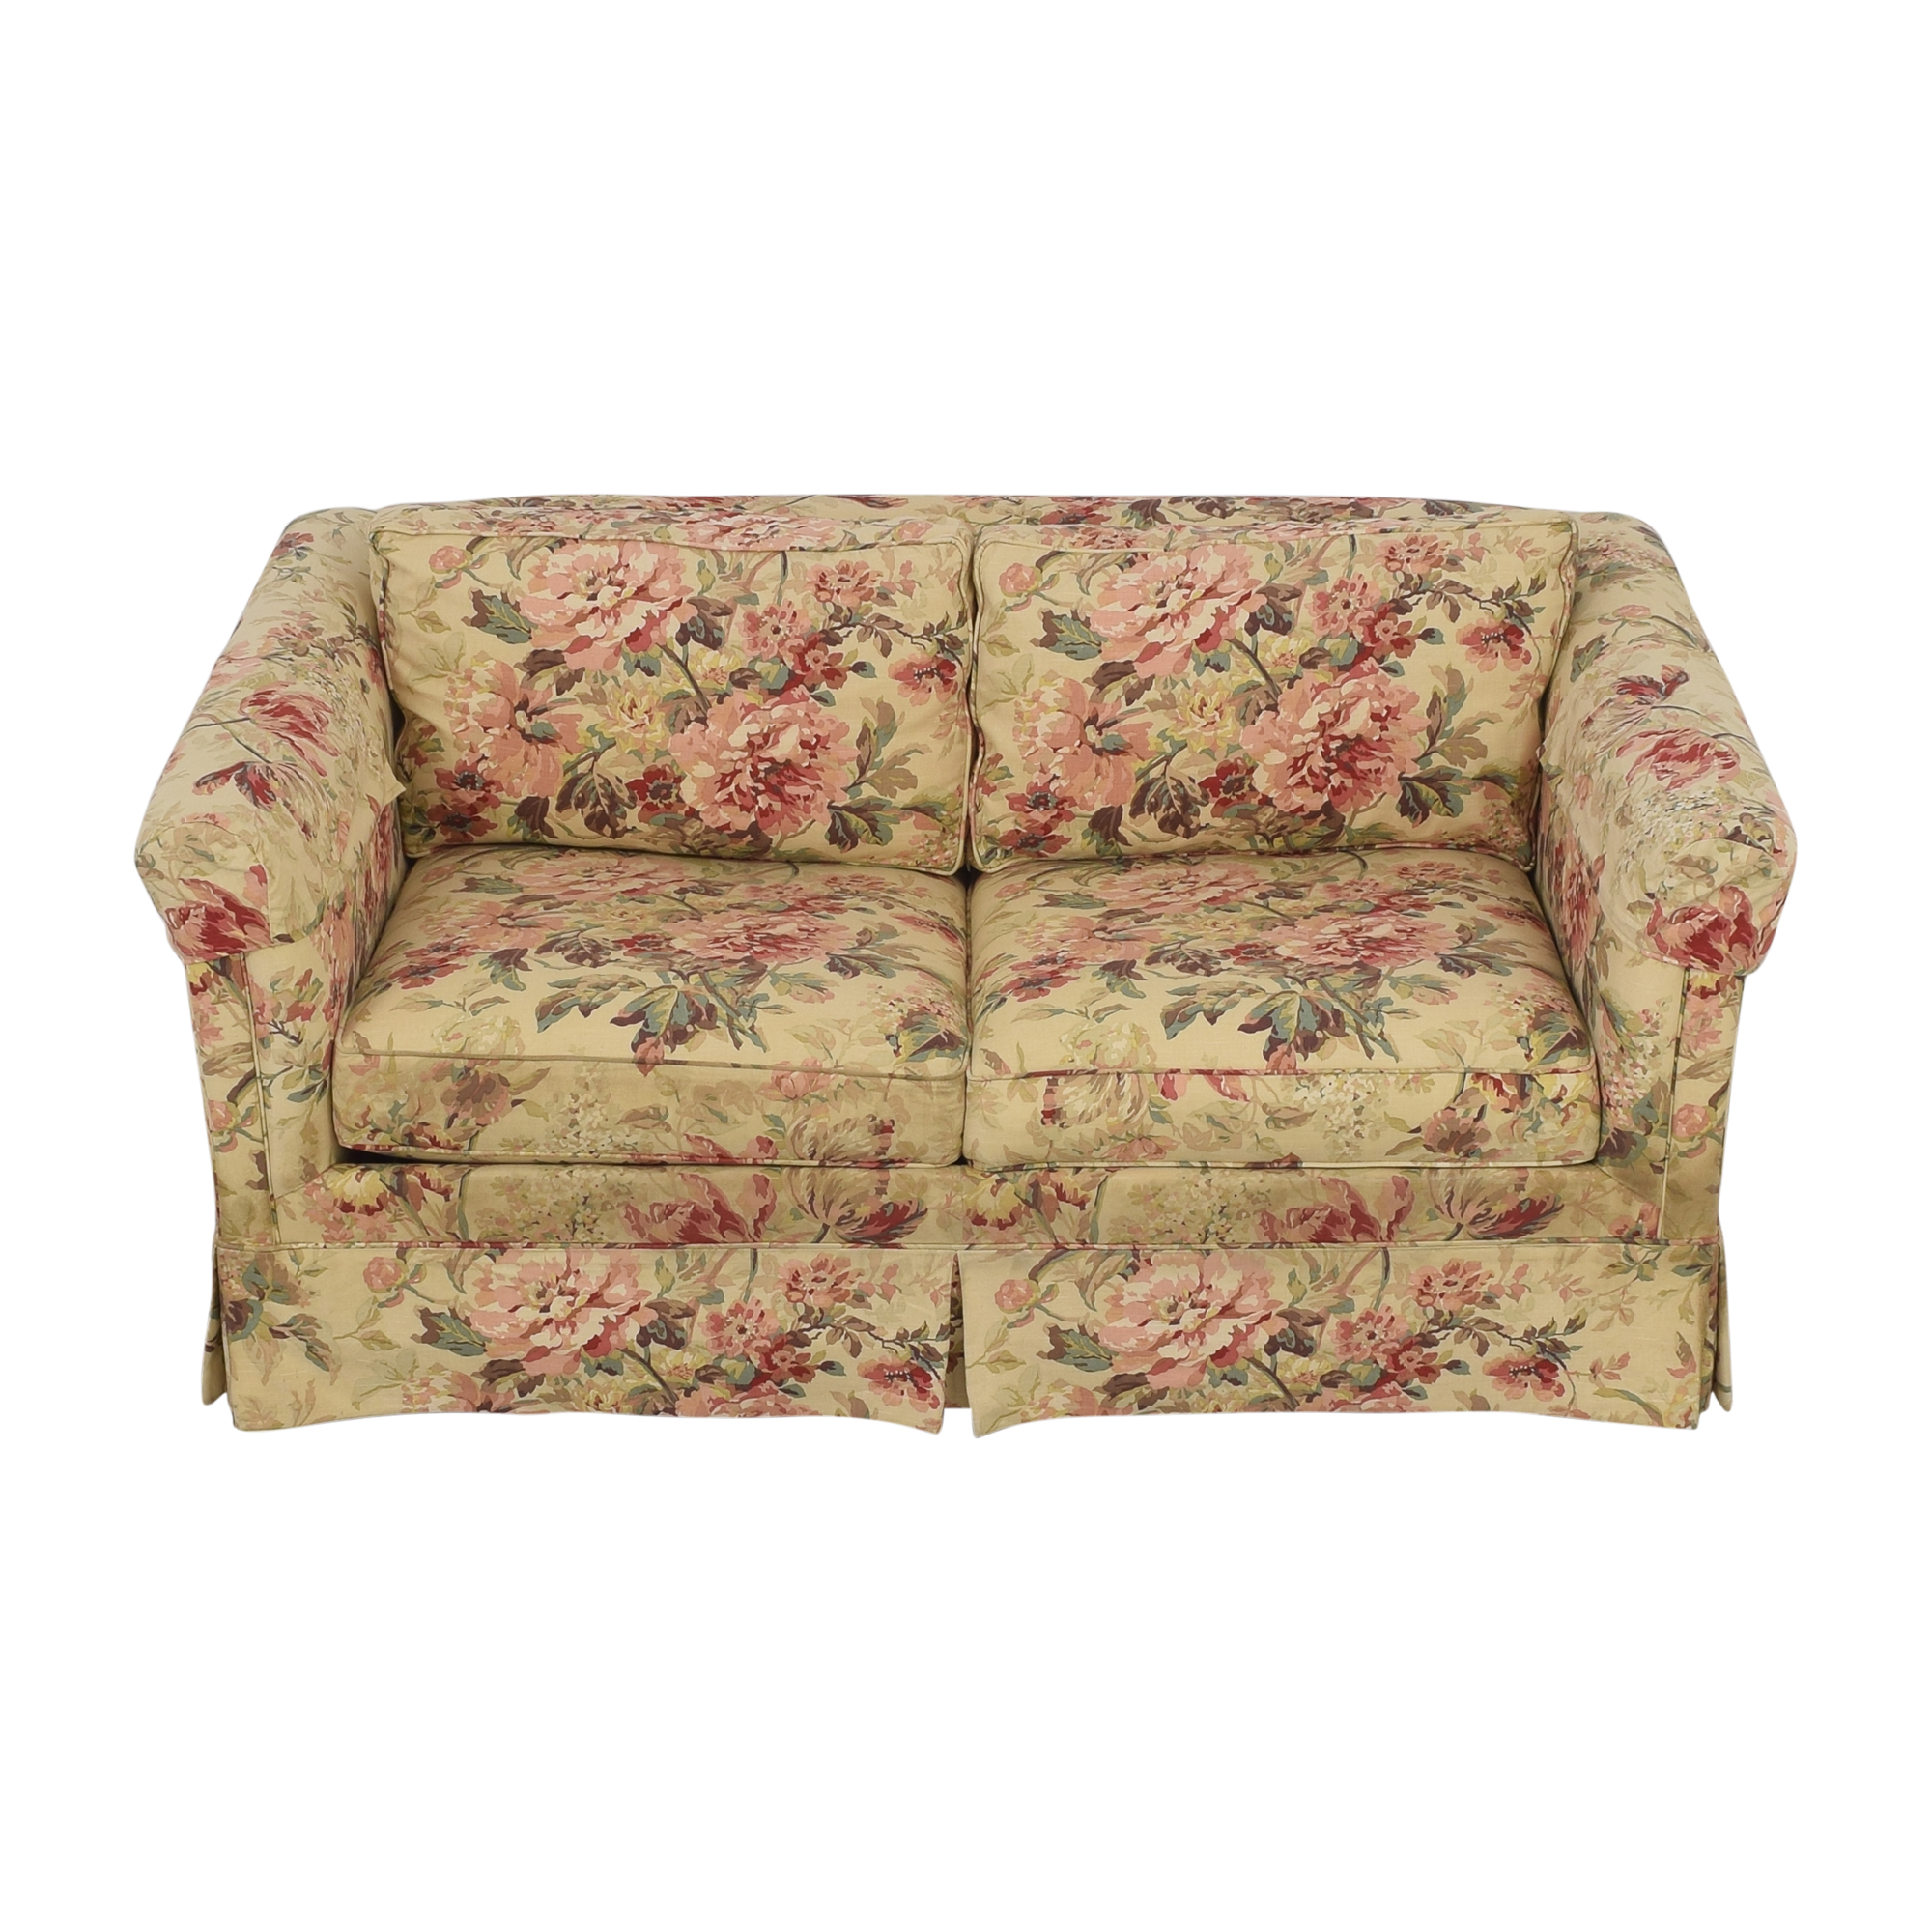 William Alan William Alan Loveseat Sleeper Sofa second hand